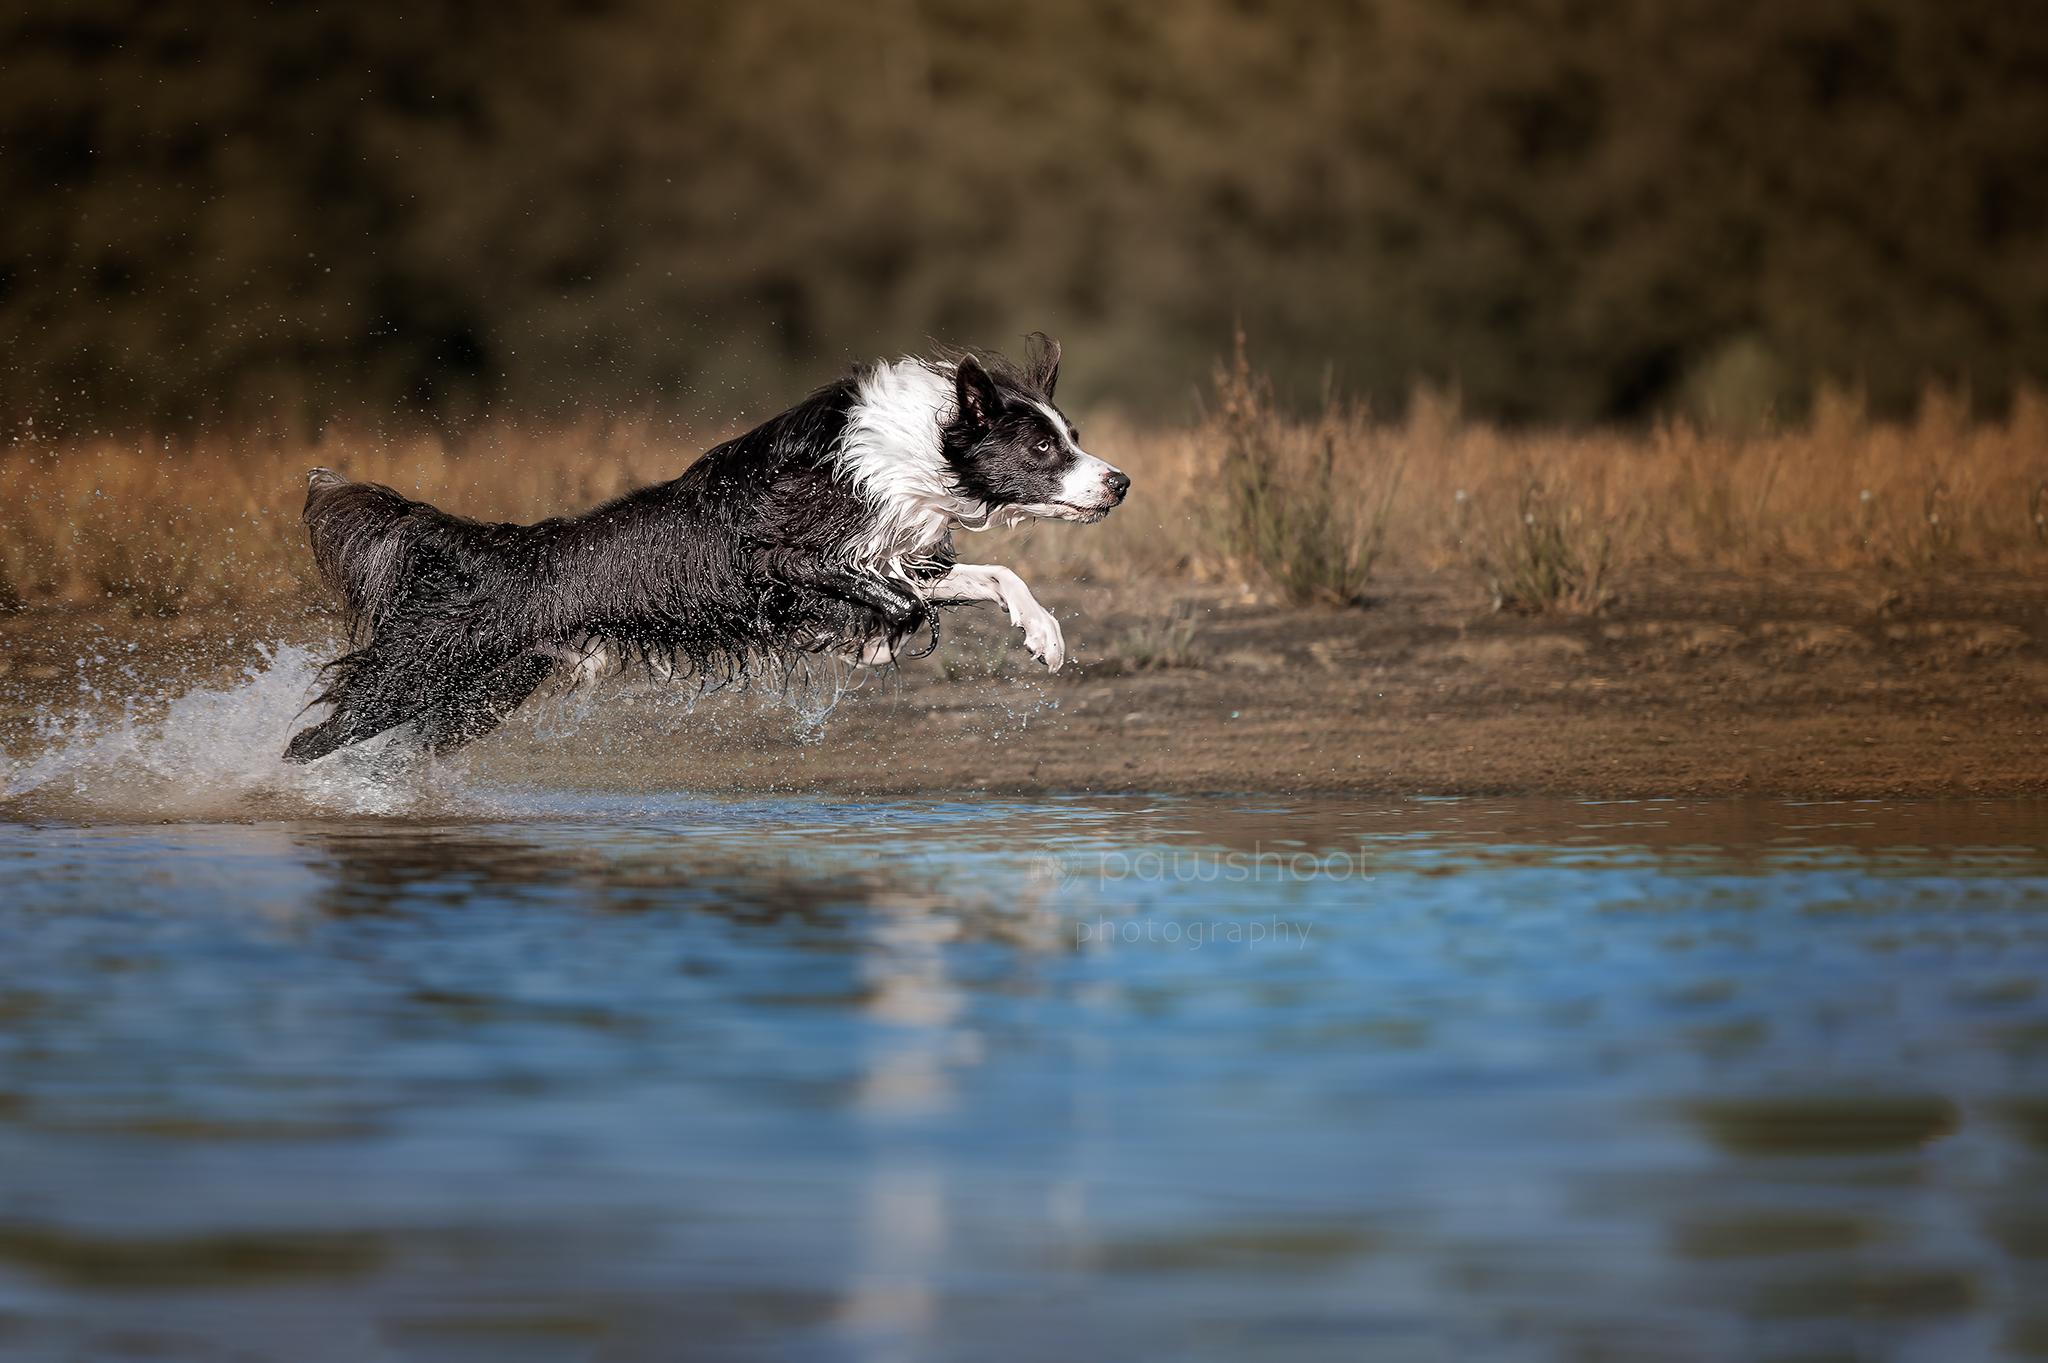 springende hond in water Pawshoot hondenfotografie